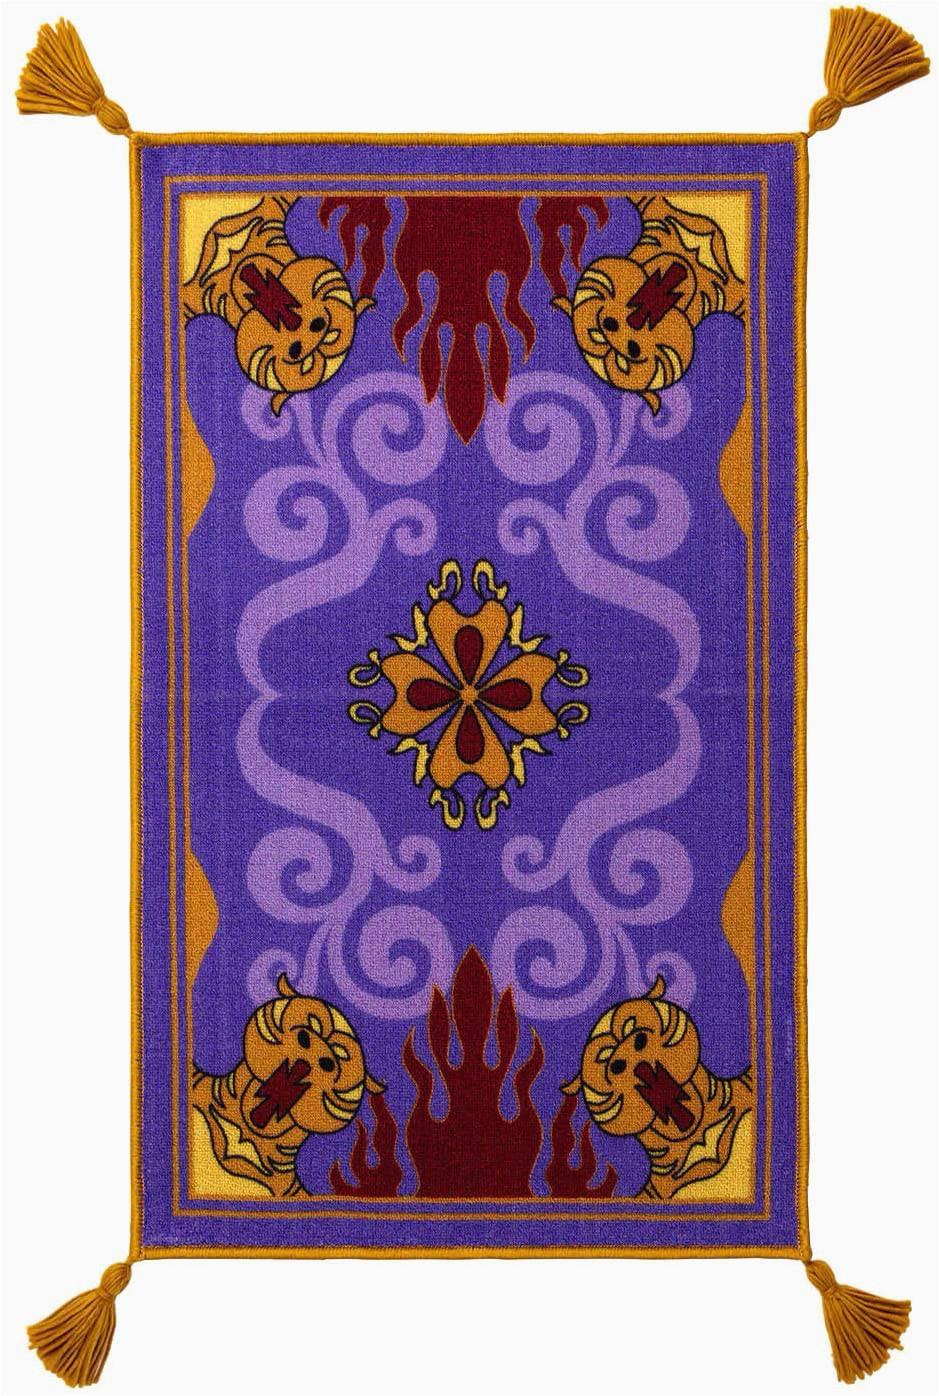 Aladdin Magic Carpet area Rug Disney Aladdin Magic Carpet area Rug